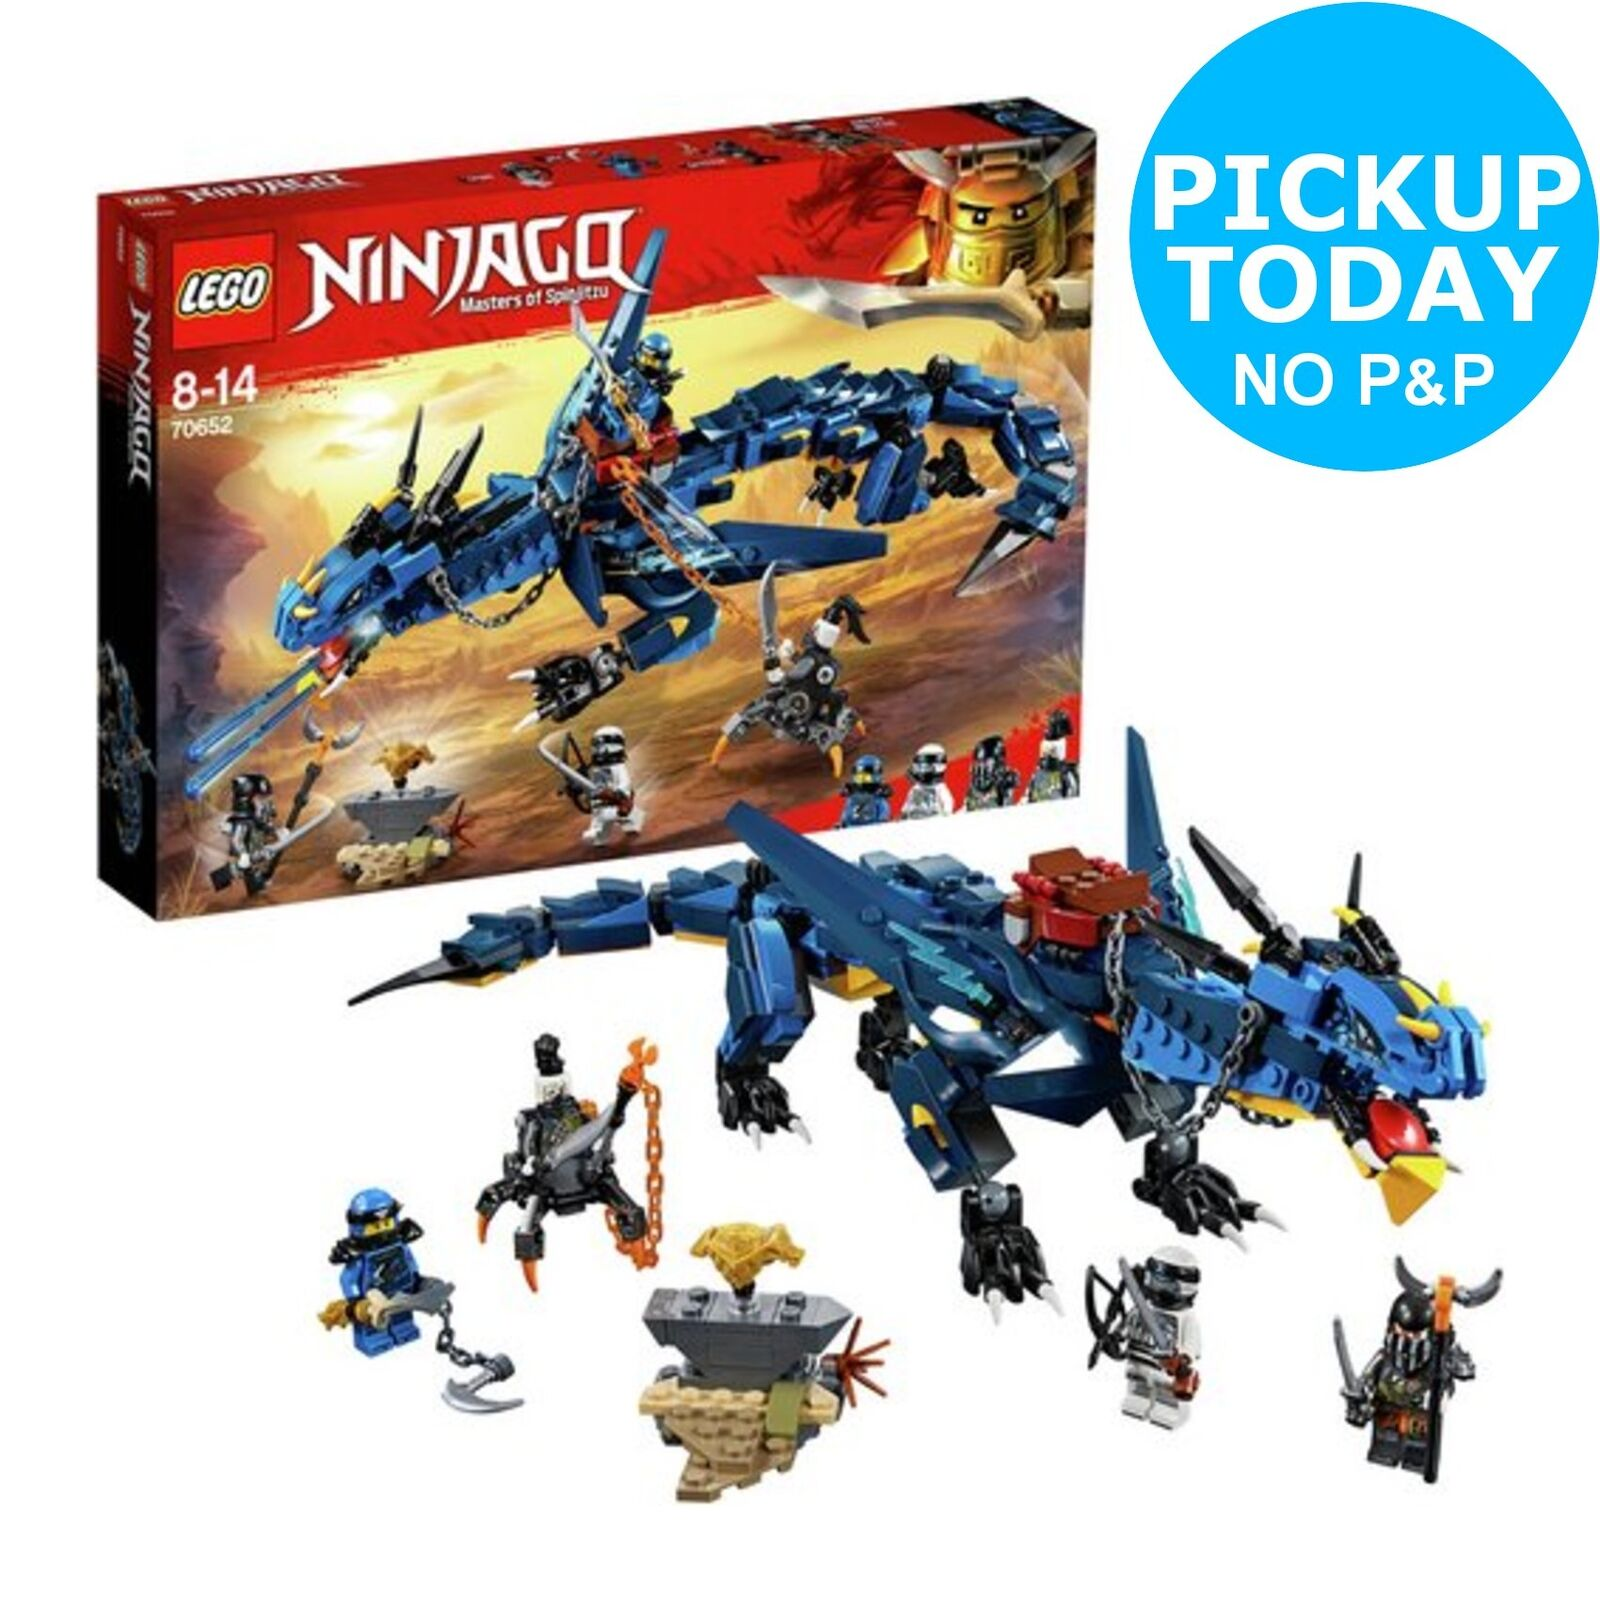 LEGO Ninjago Stormbringer Action Figure Dragon Toy - 70652